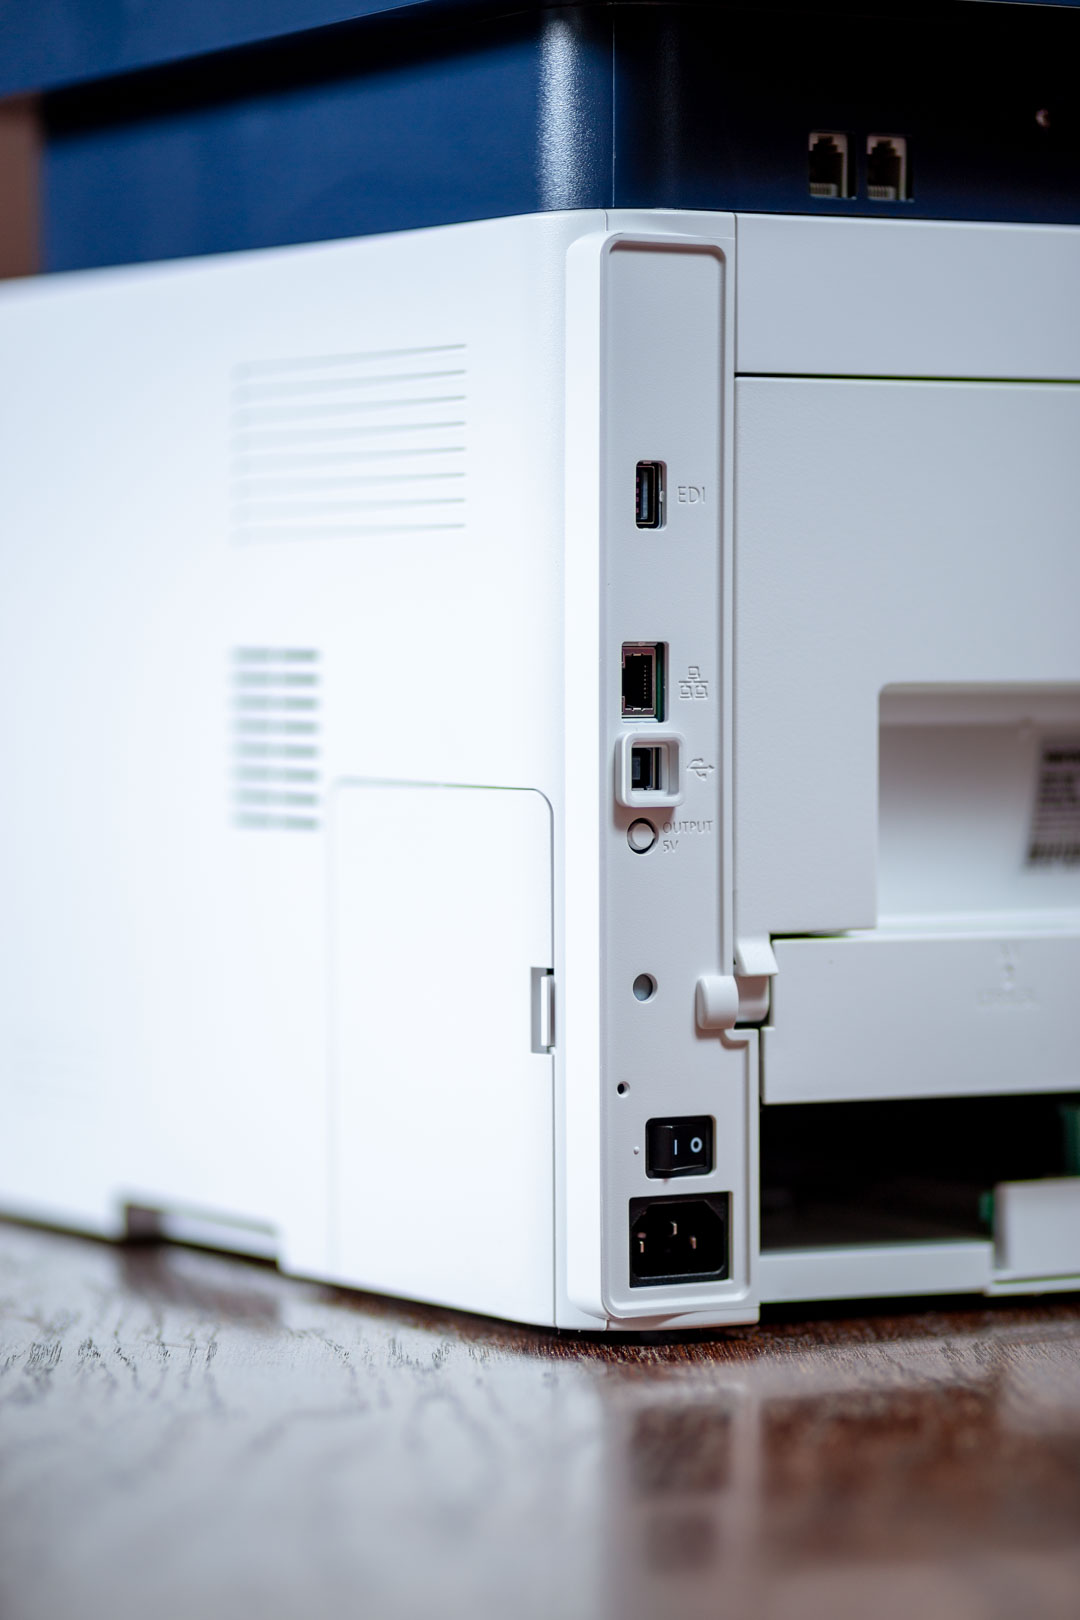 Xerox multifunkciós irodai lézernyomtató - 3335V_DNI WiFi, Ethernet, Fax, USB